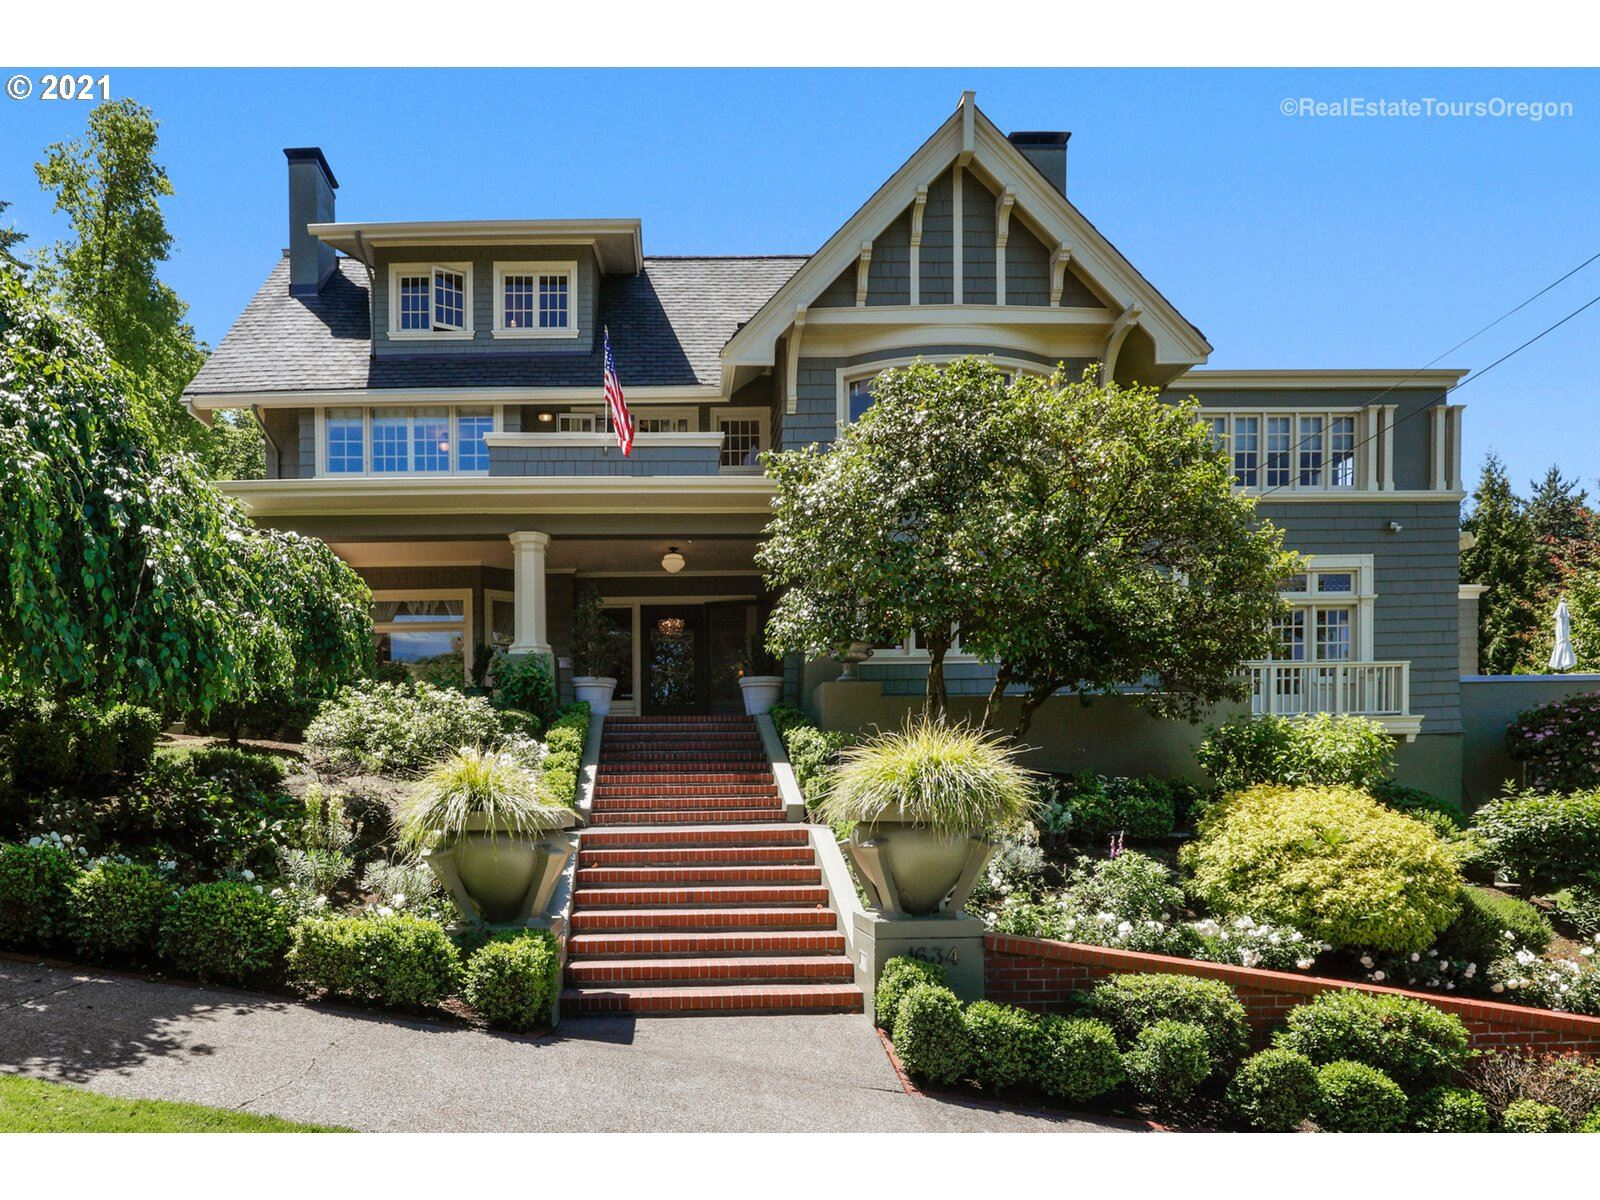 1634 SW MYRTLE ST, Portland, OR 97201 - MLS#: 21363929